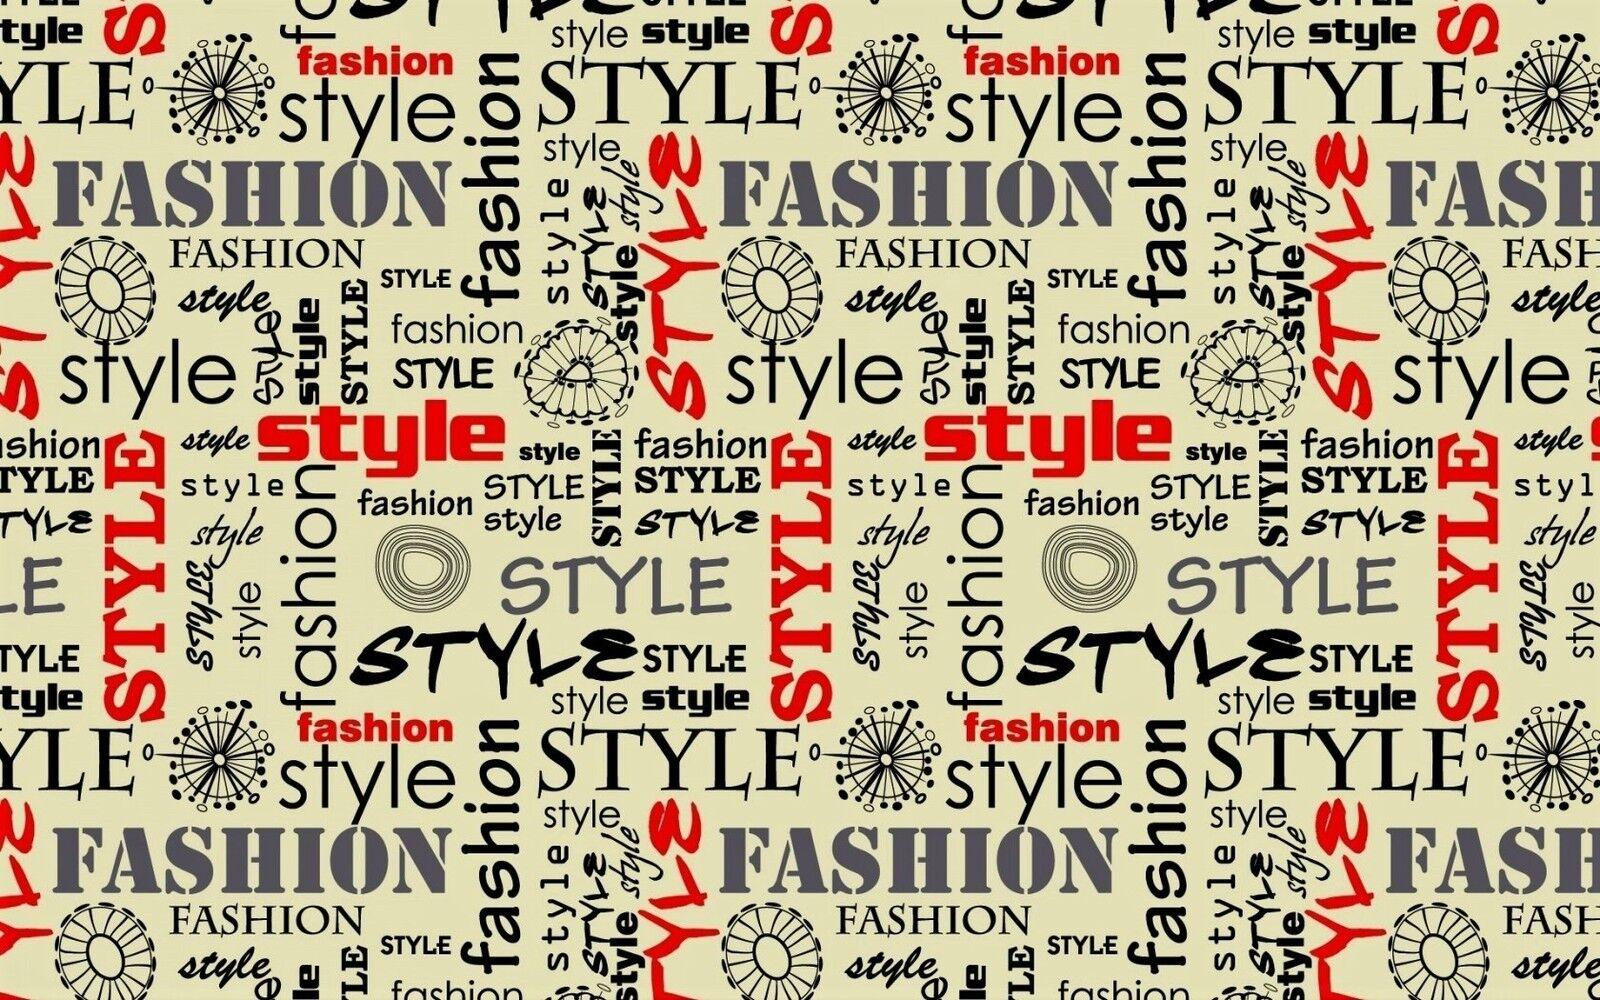 Ley Ley's Fashion House